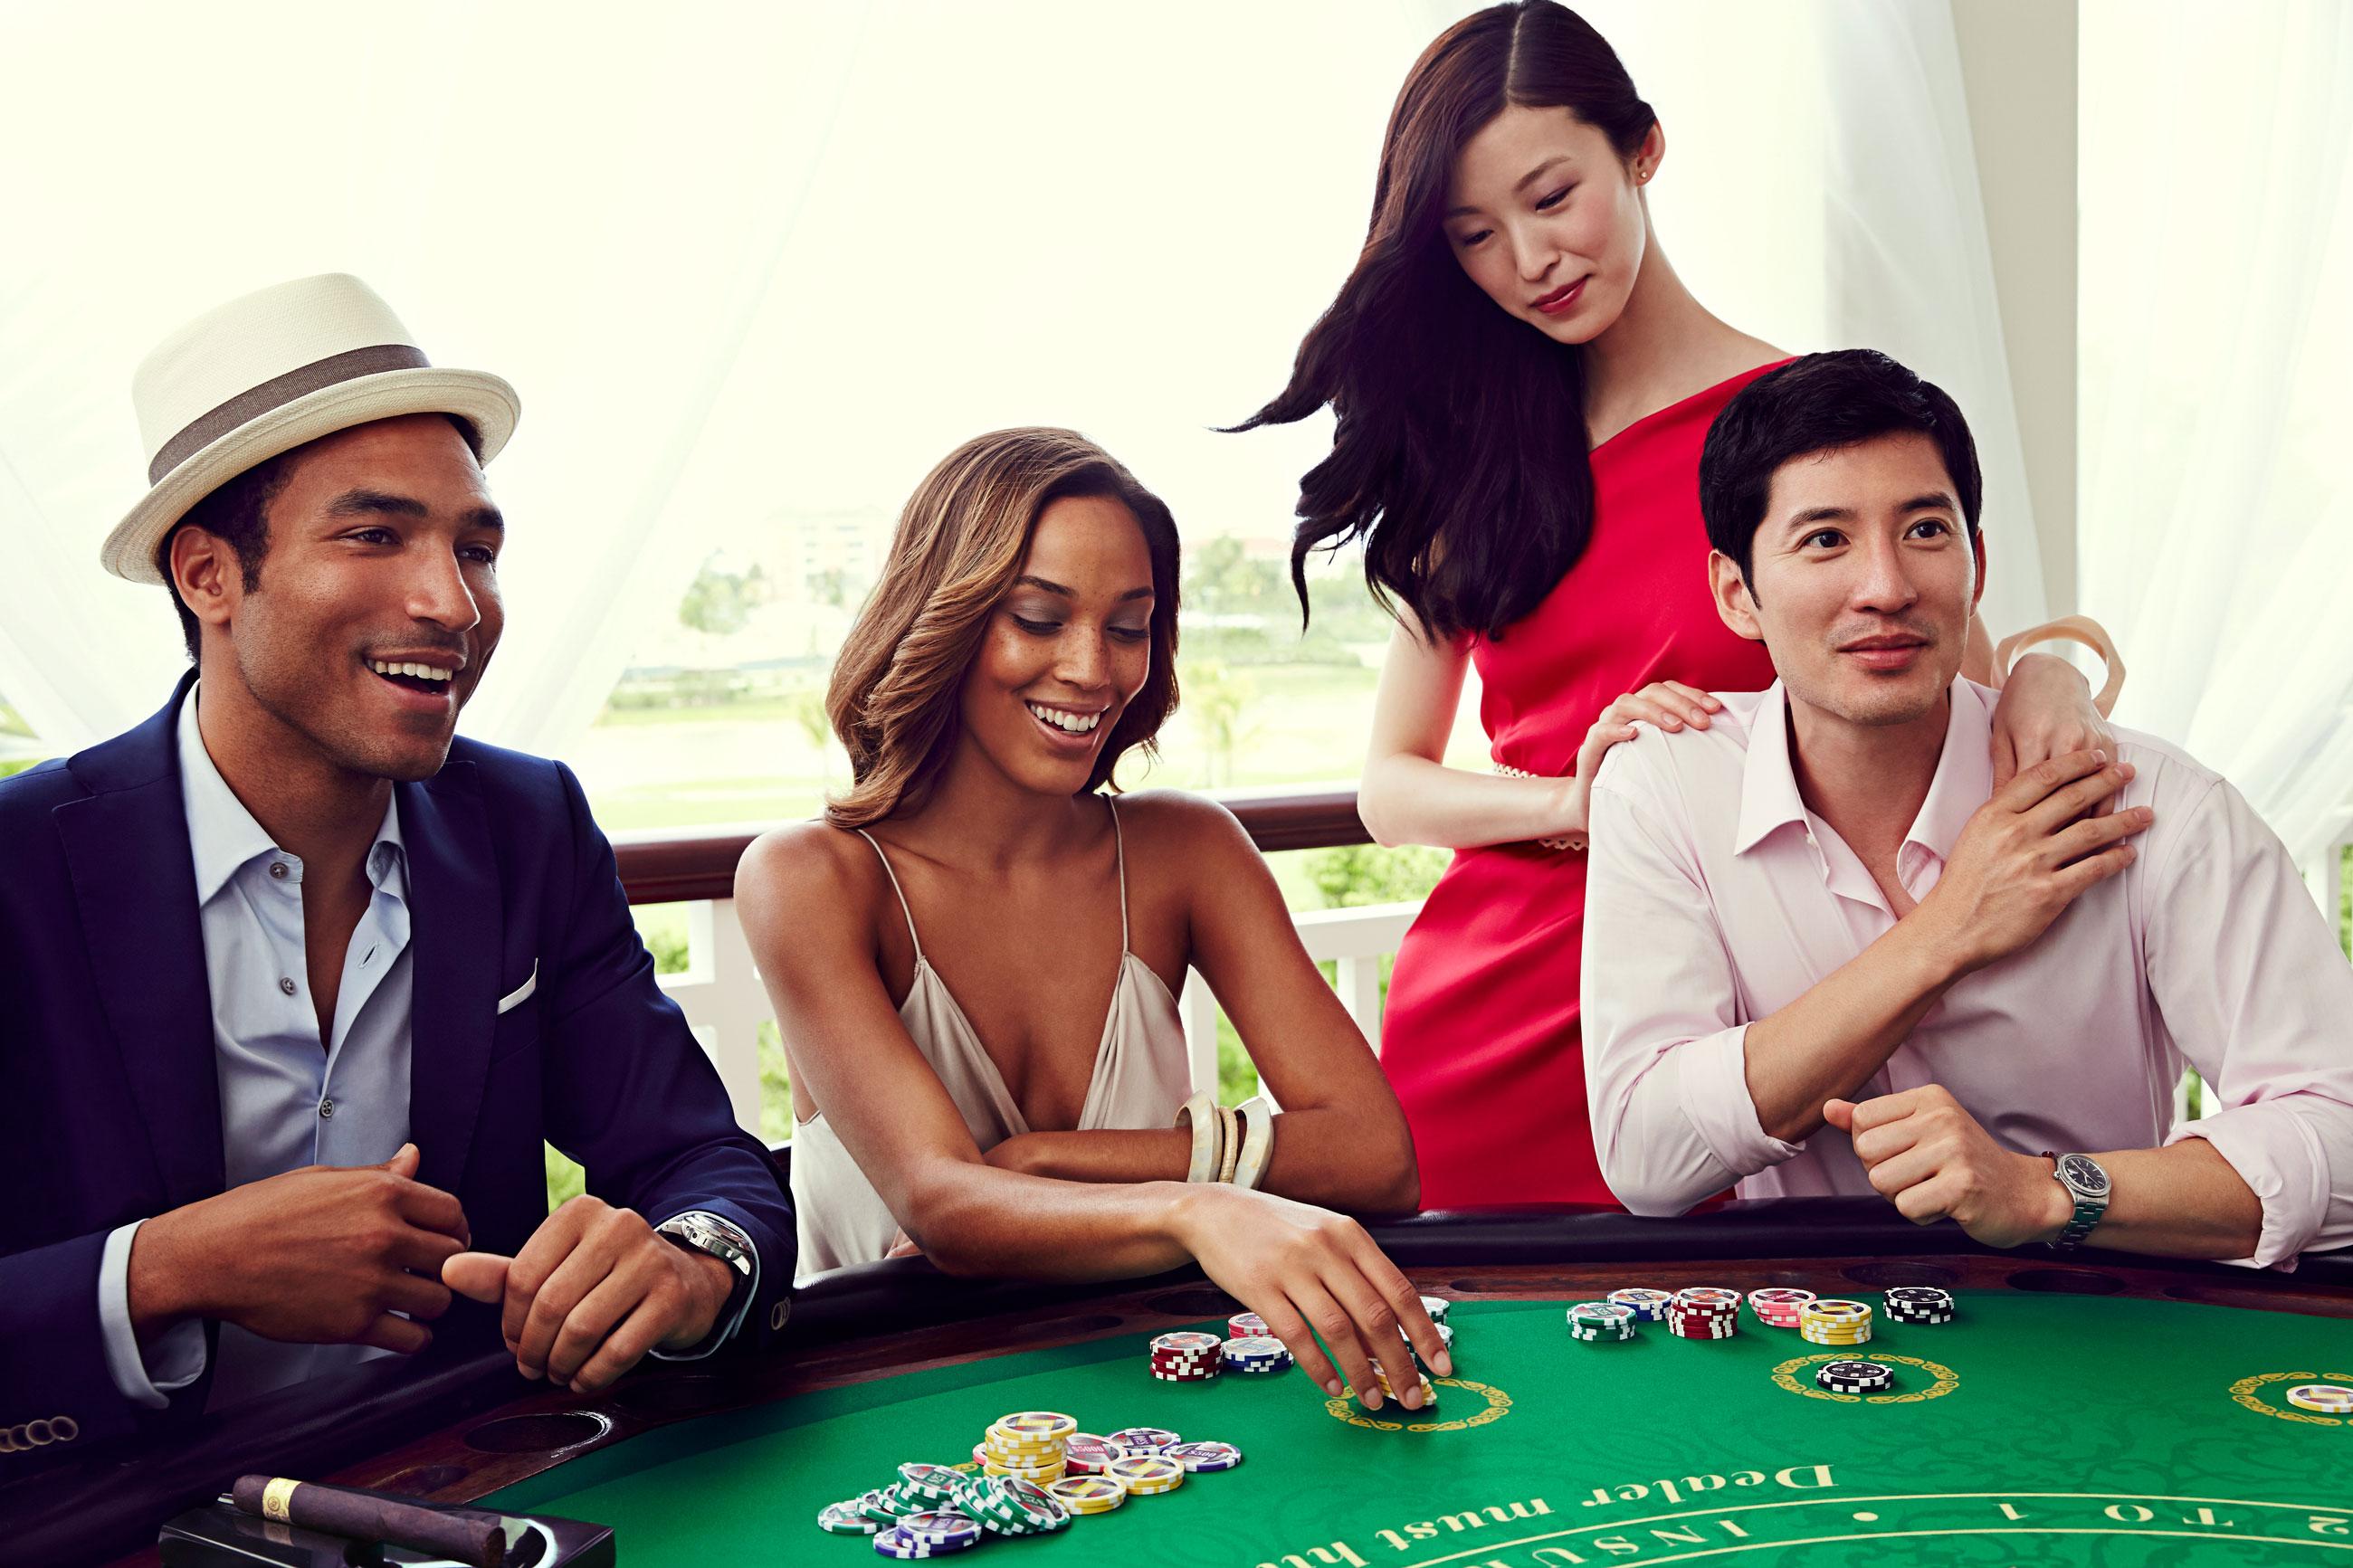 Group playing blackjack